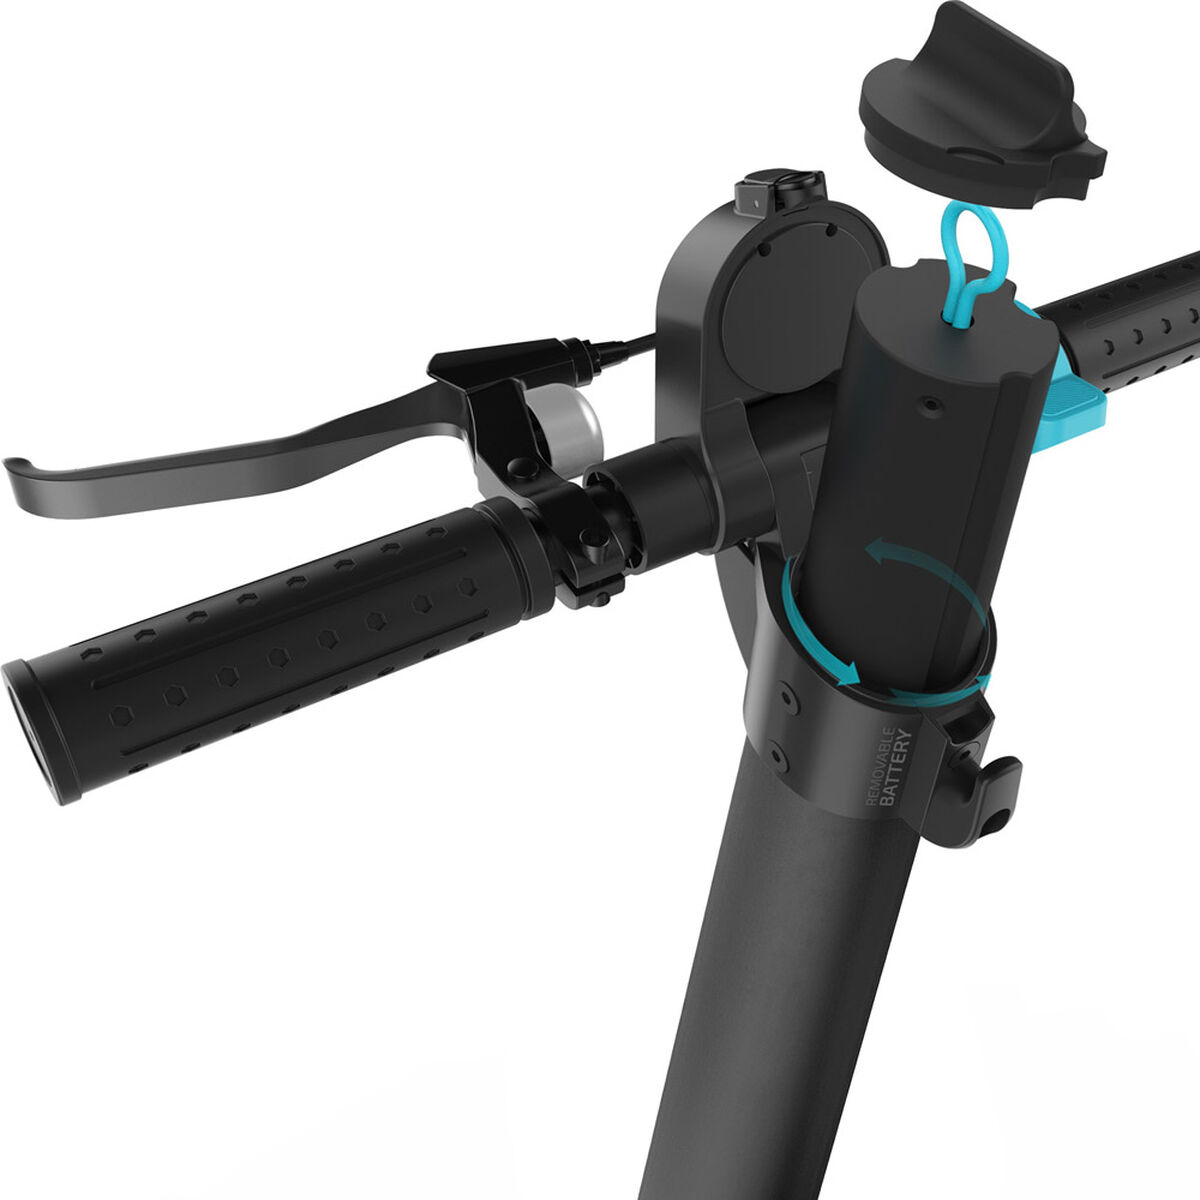 Scooter Eléctrico Plegable Xcooter X7